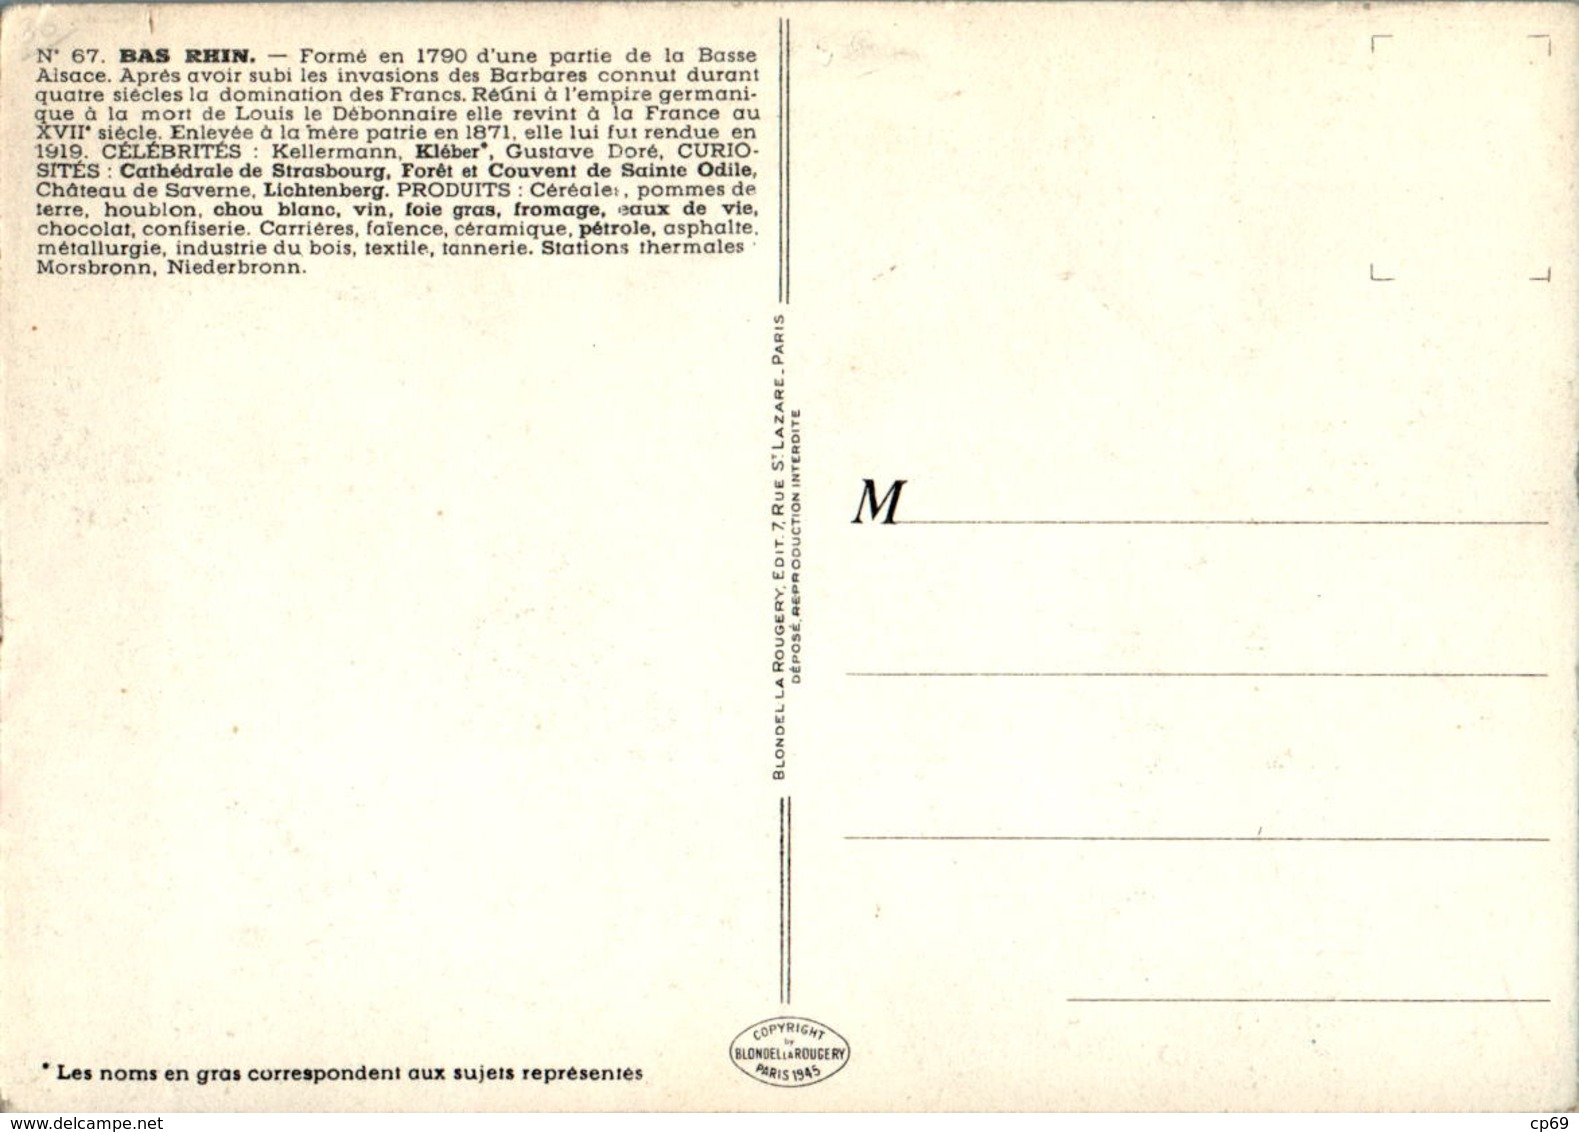 PINCHON Année 1945 Département Du Bas-Rhin (67) Strasbourg Sélestat Saverne Haguenau Wissembourg Erstein Schirmeck TB.E - France